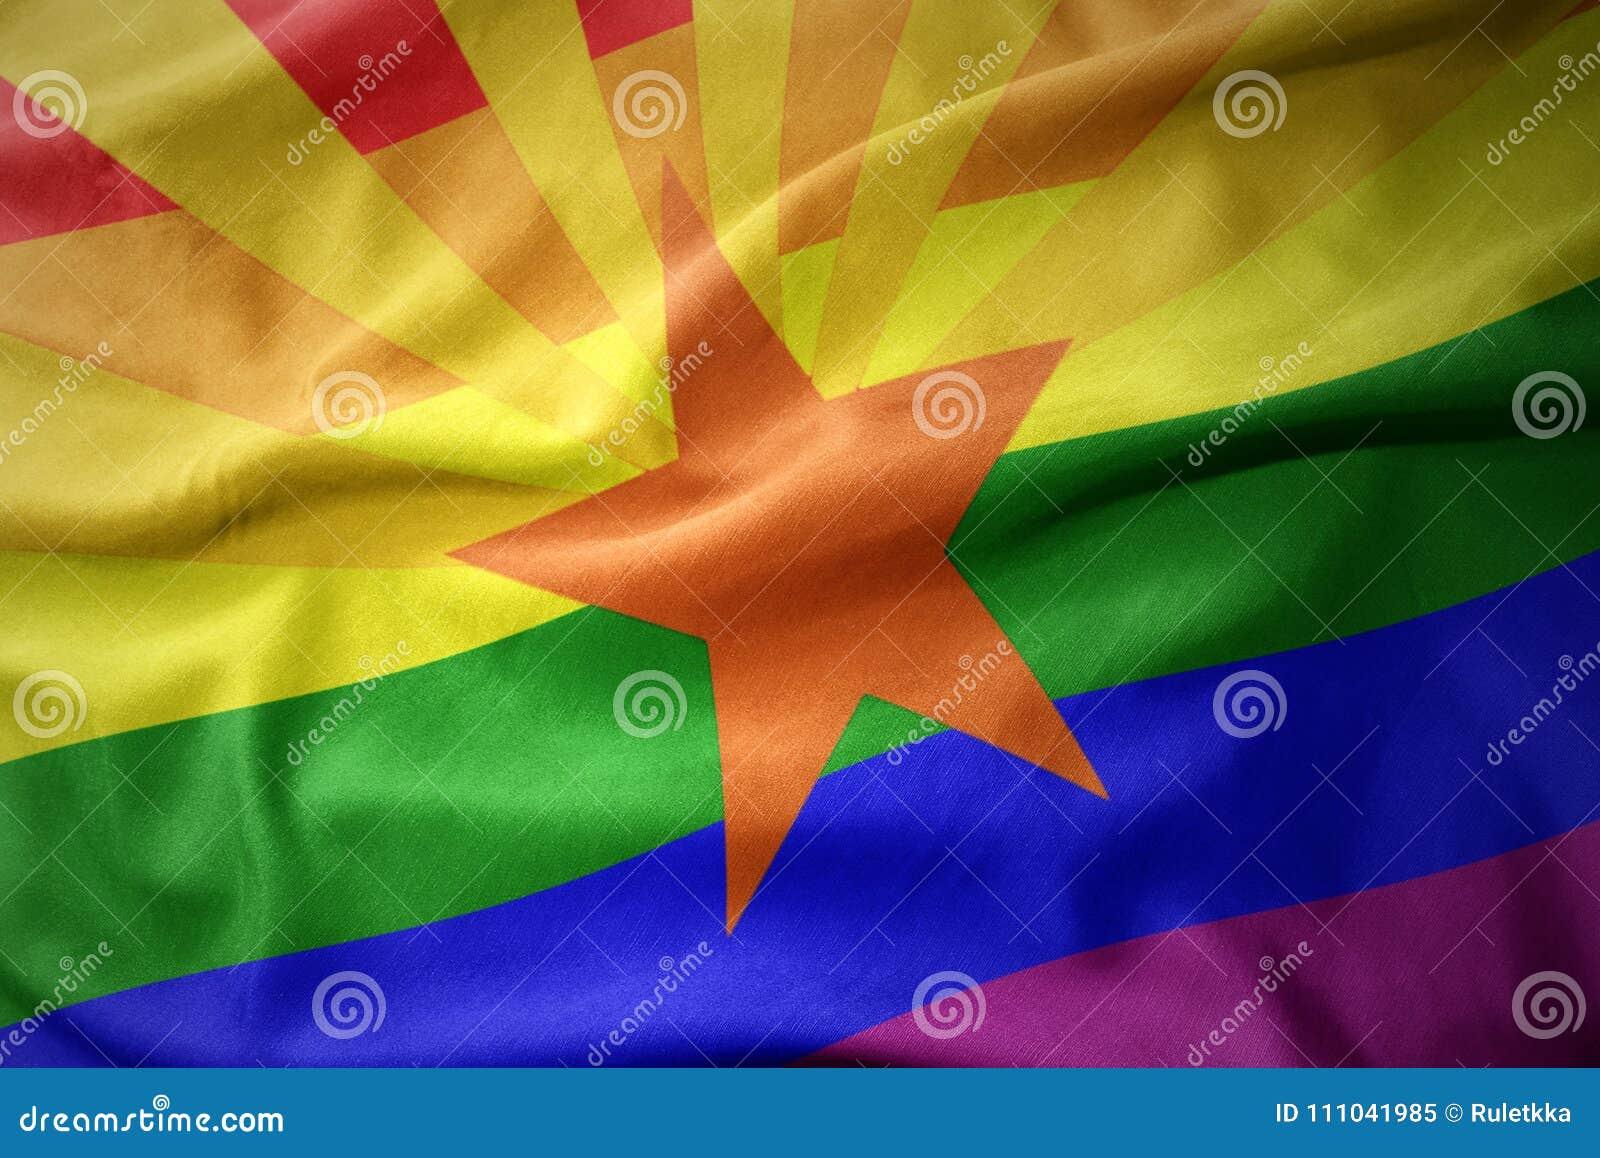 Развевая знамя флага гей-парада радуги положения Аризоны